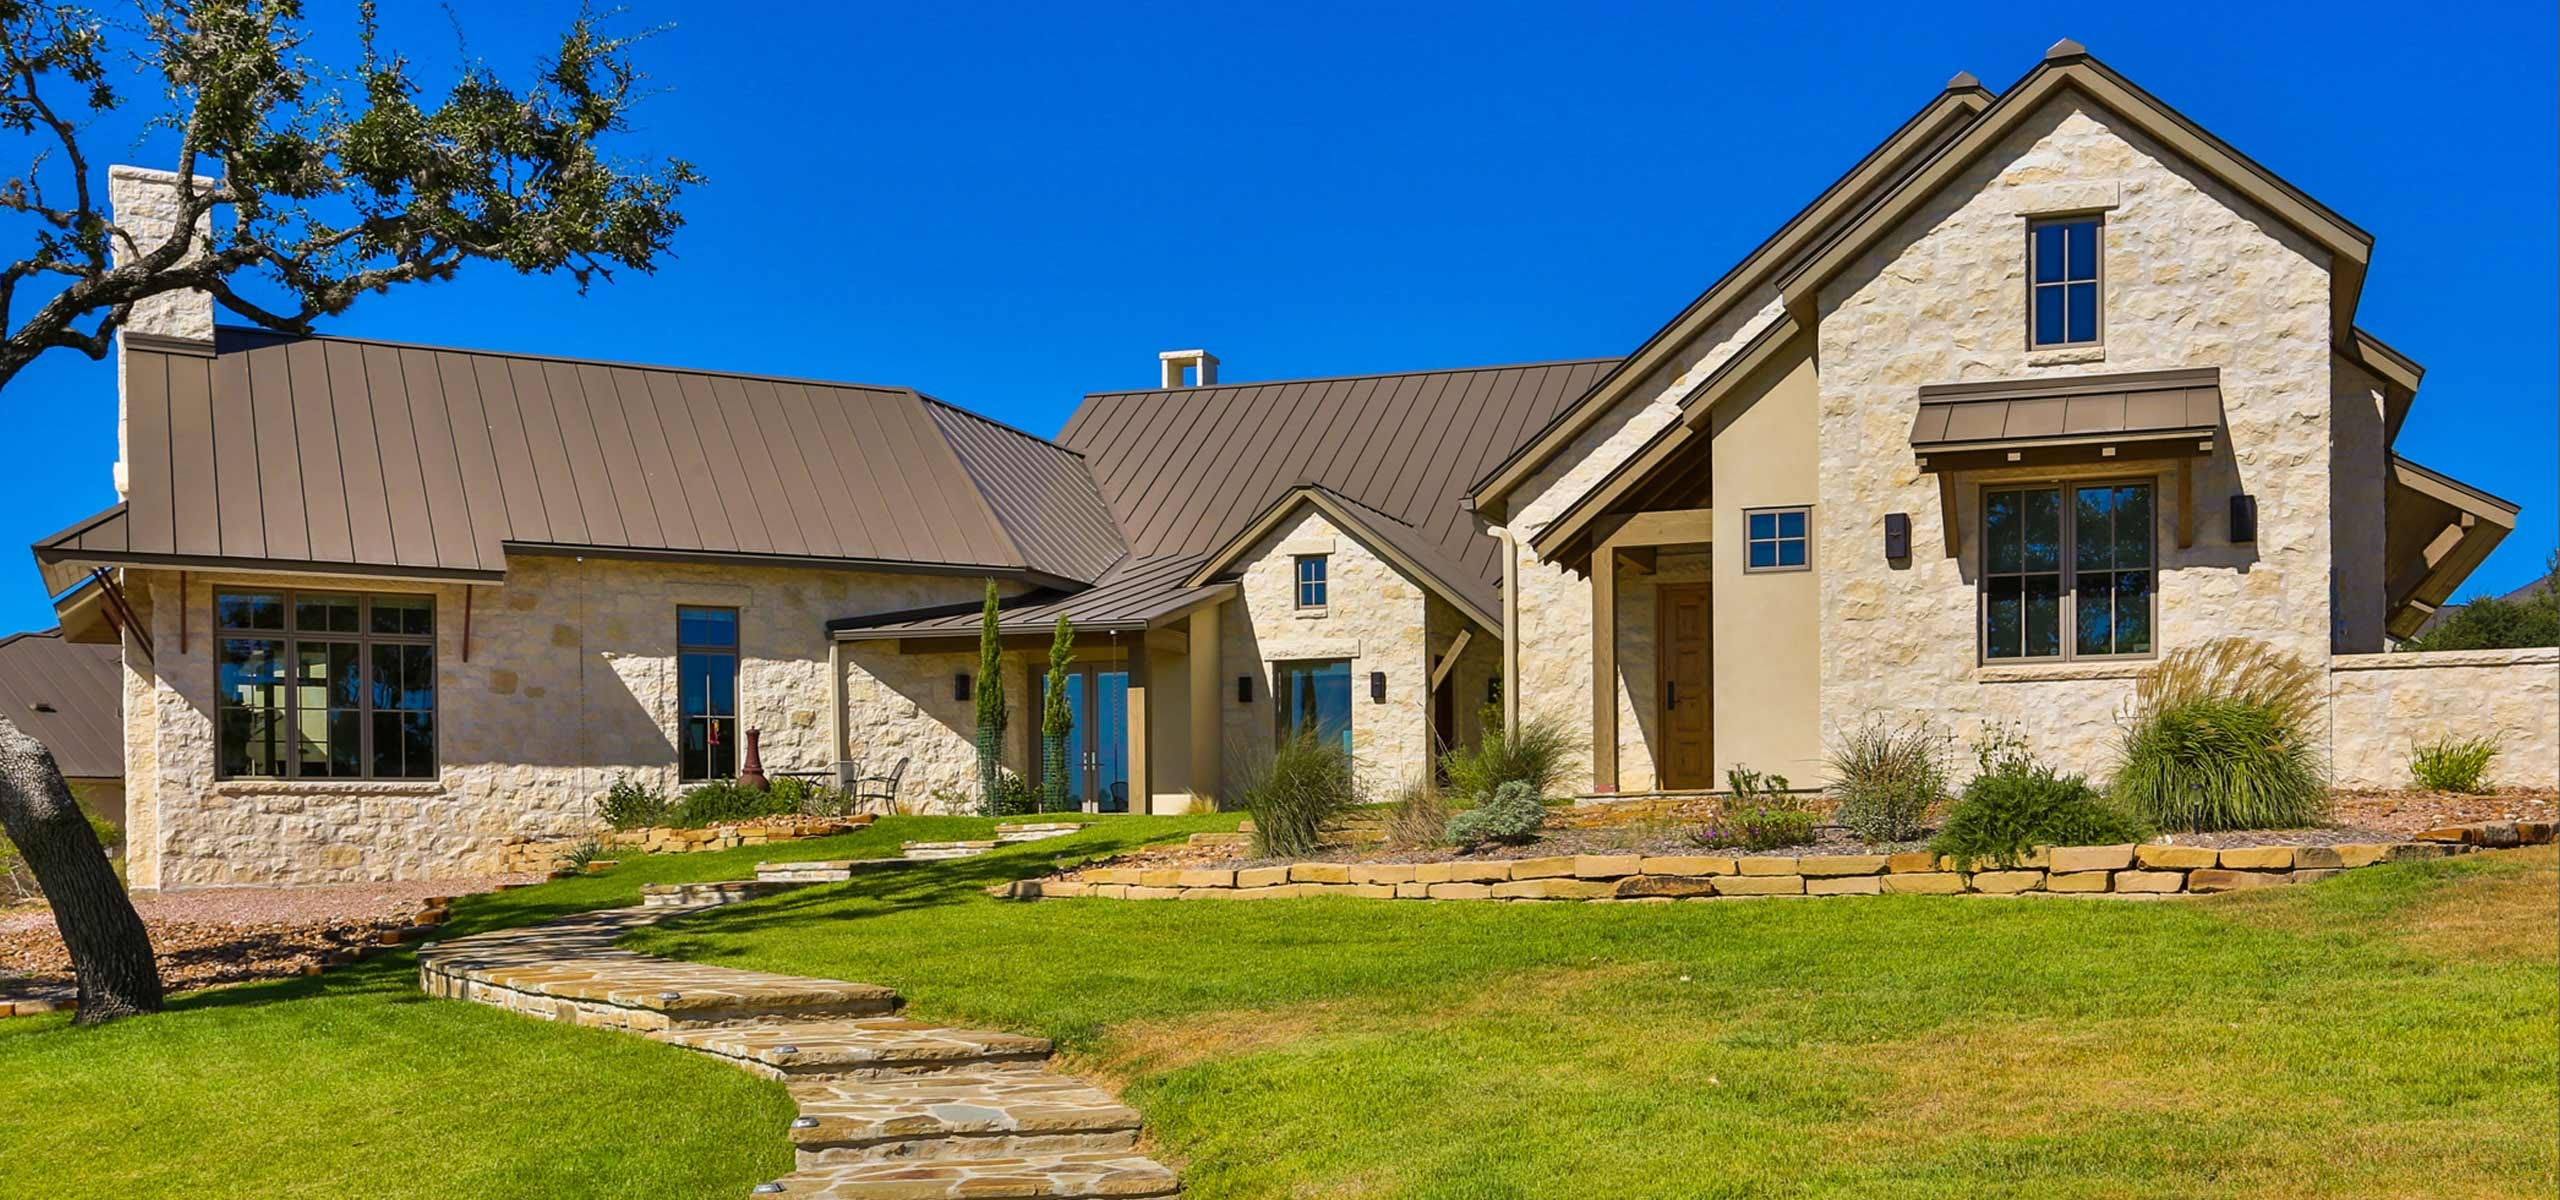 Home texas home plans for Texas house designs